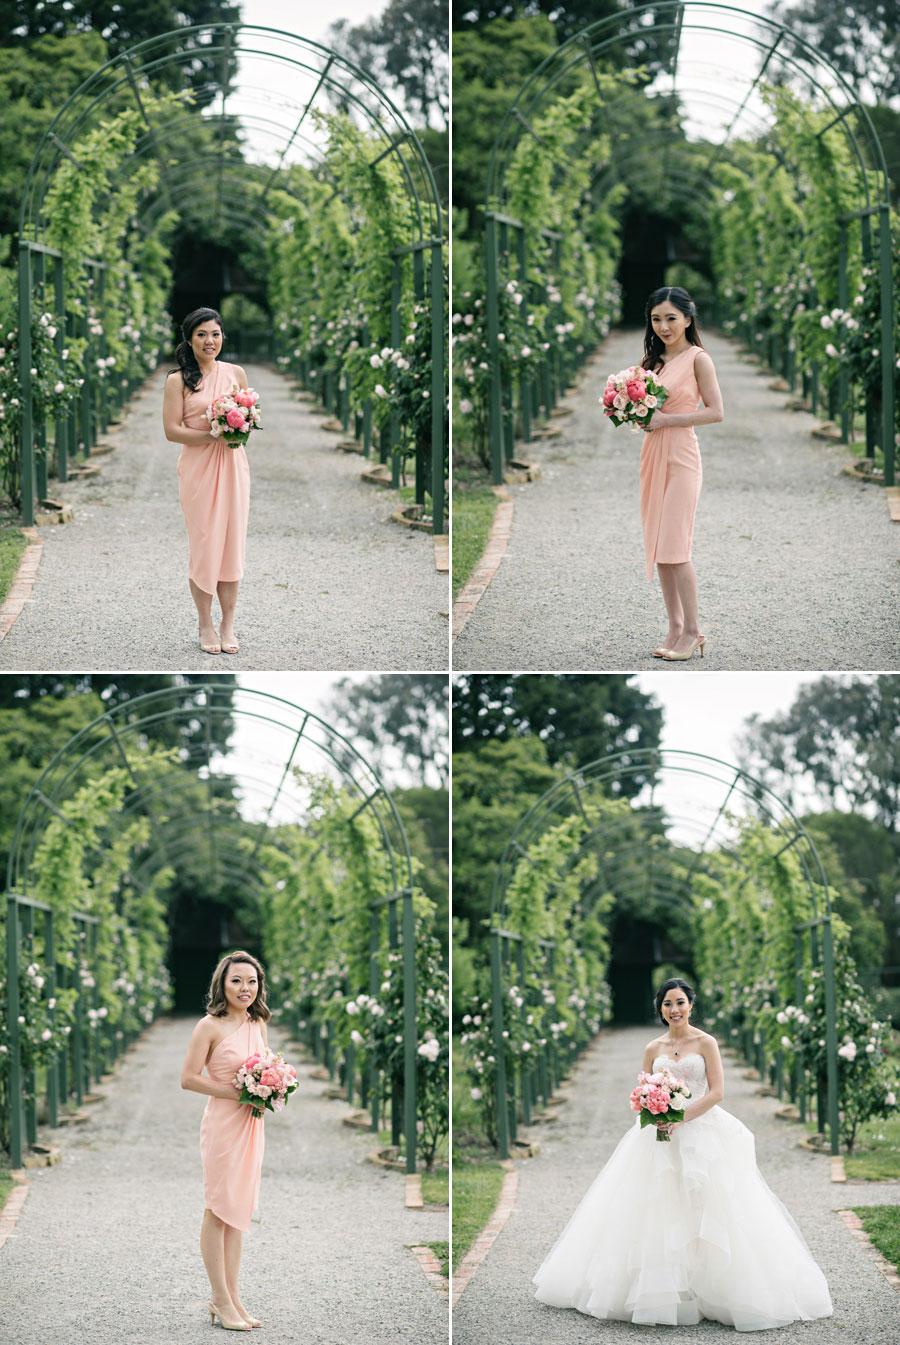 wedding-photography-coombe-yarra-valley-bella-emerson-081.jpg